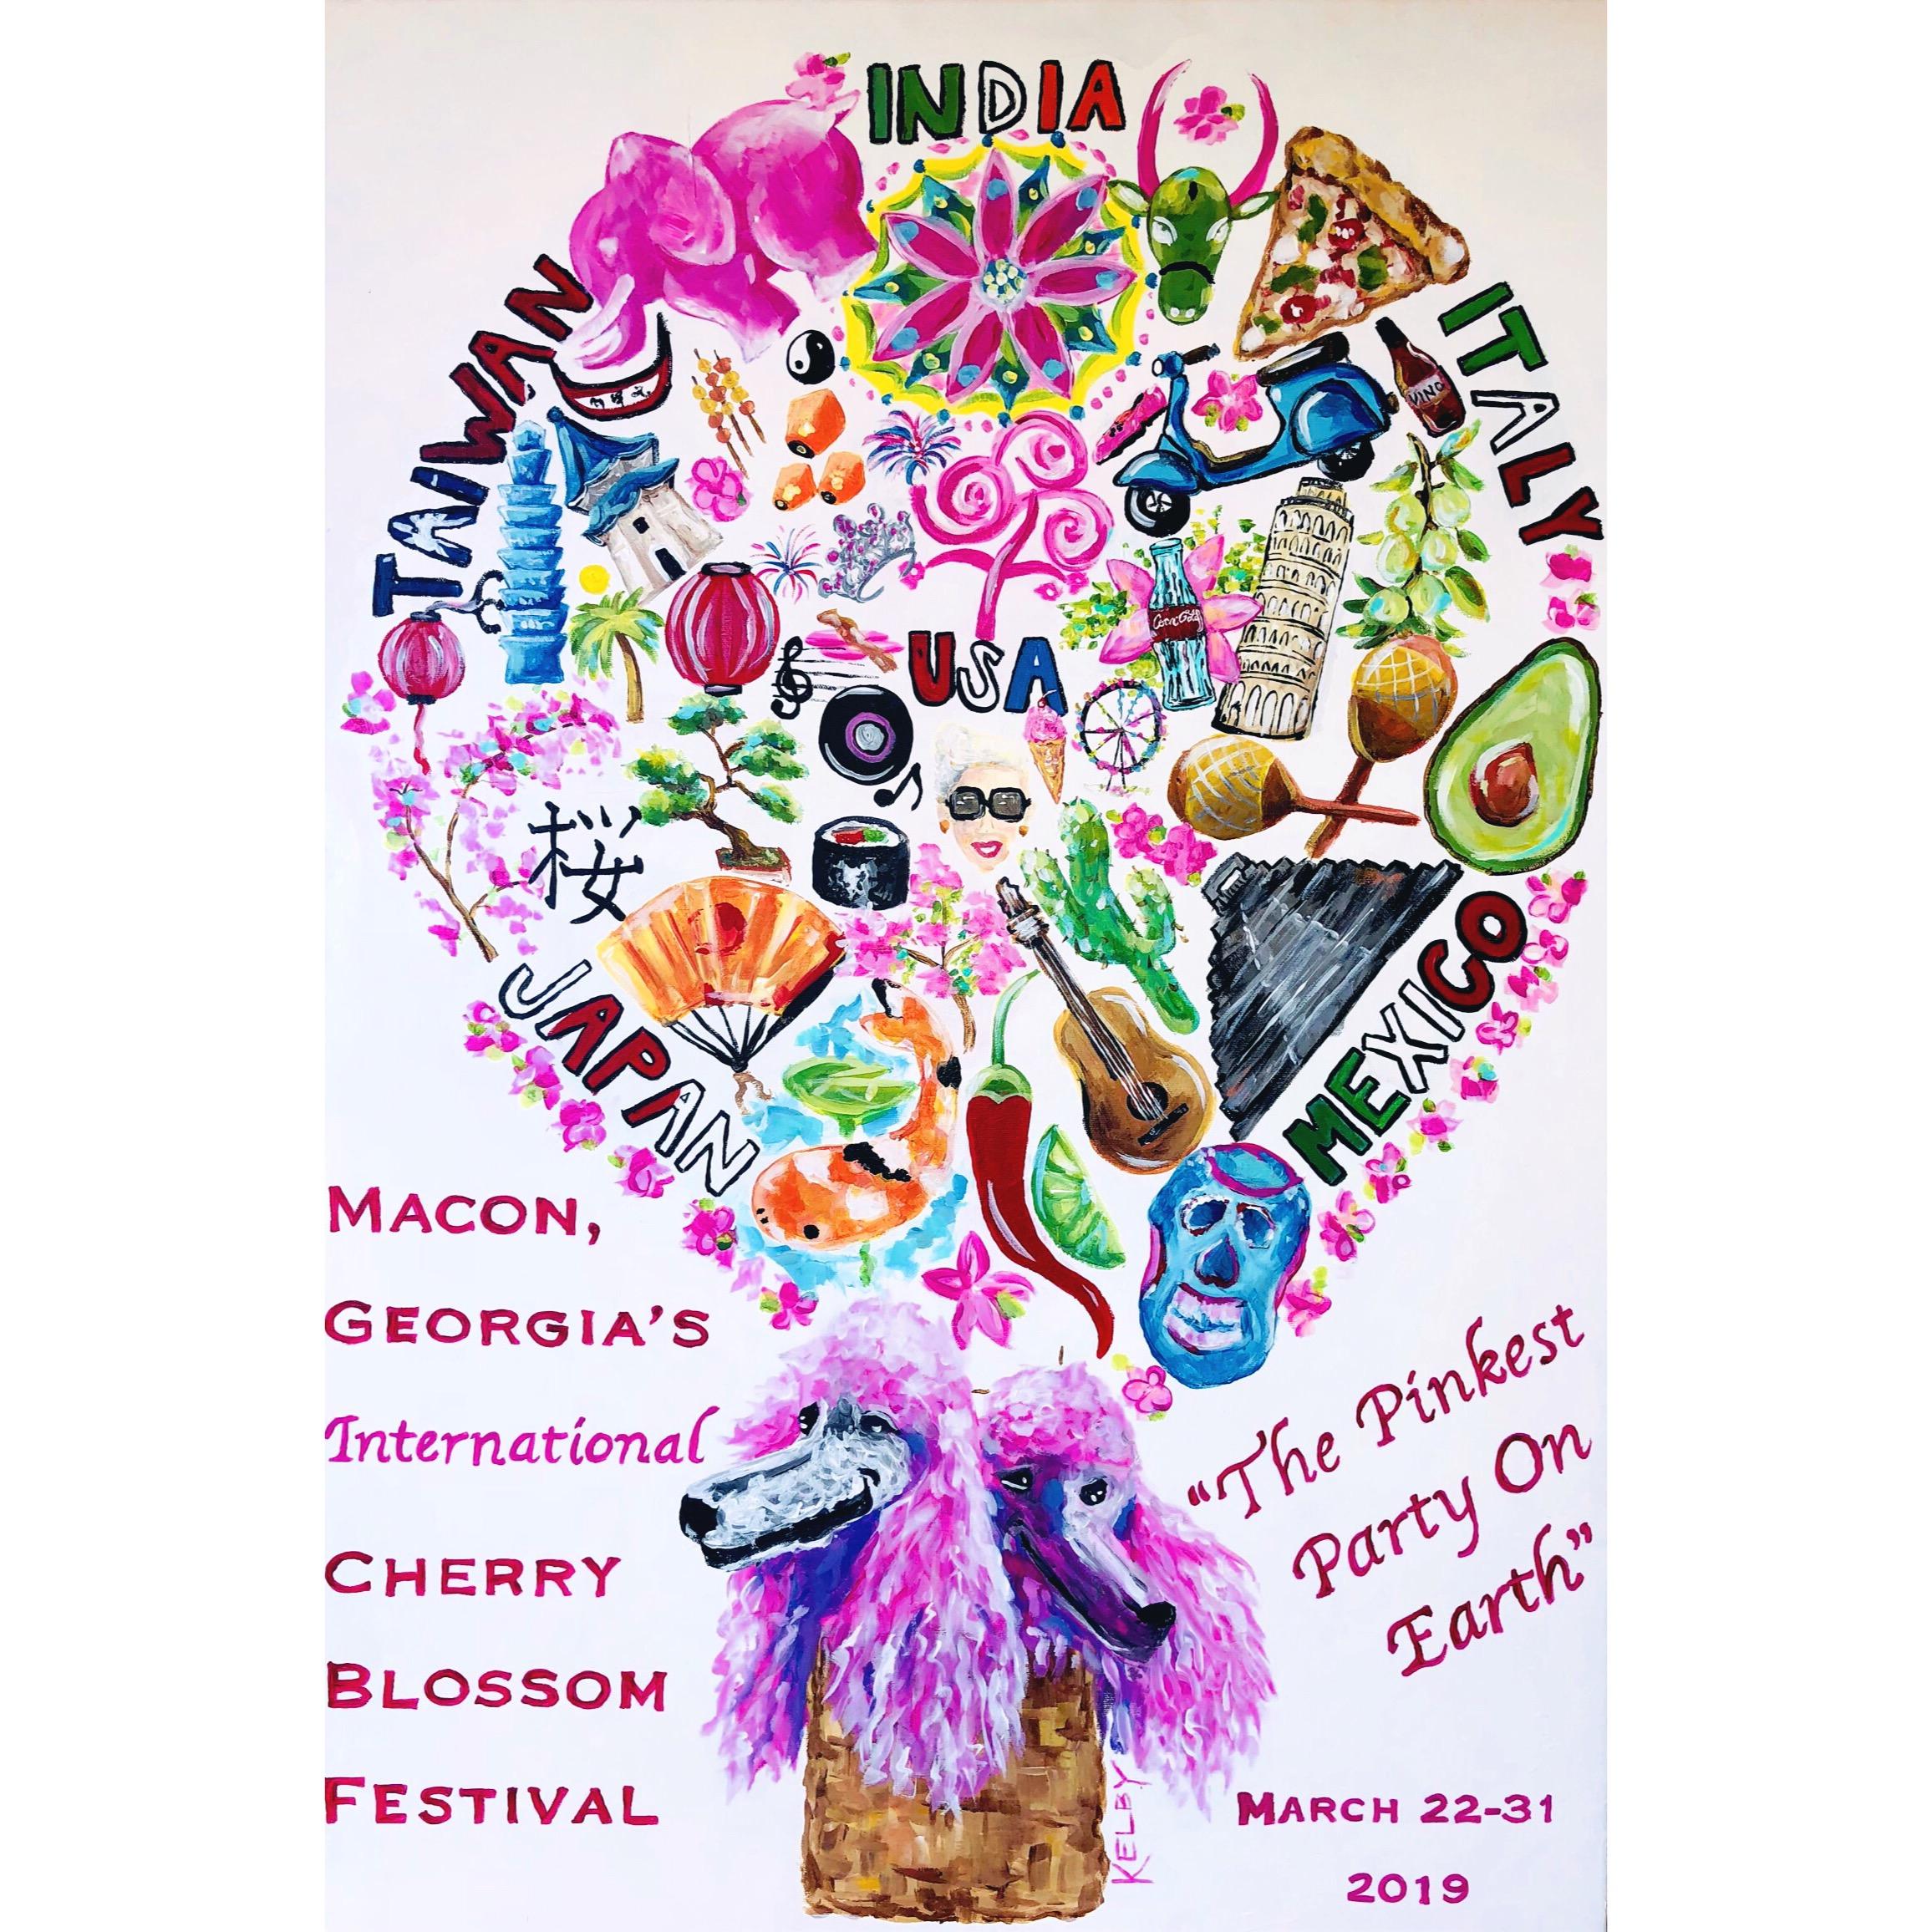 Cherry Blossom Festival Official Poster